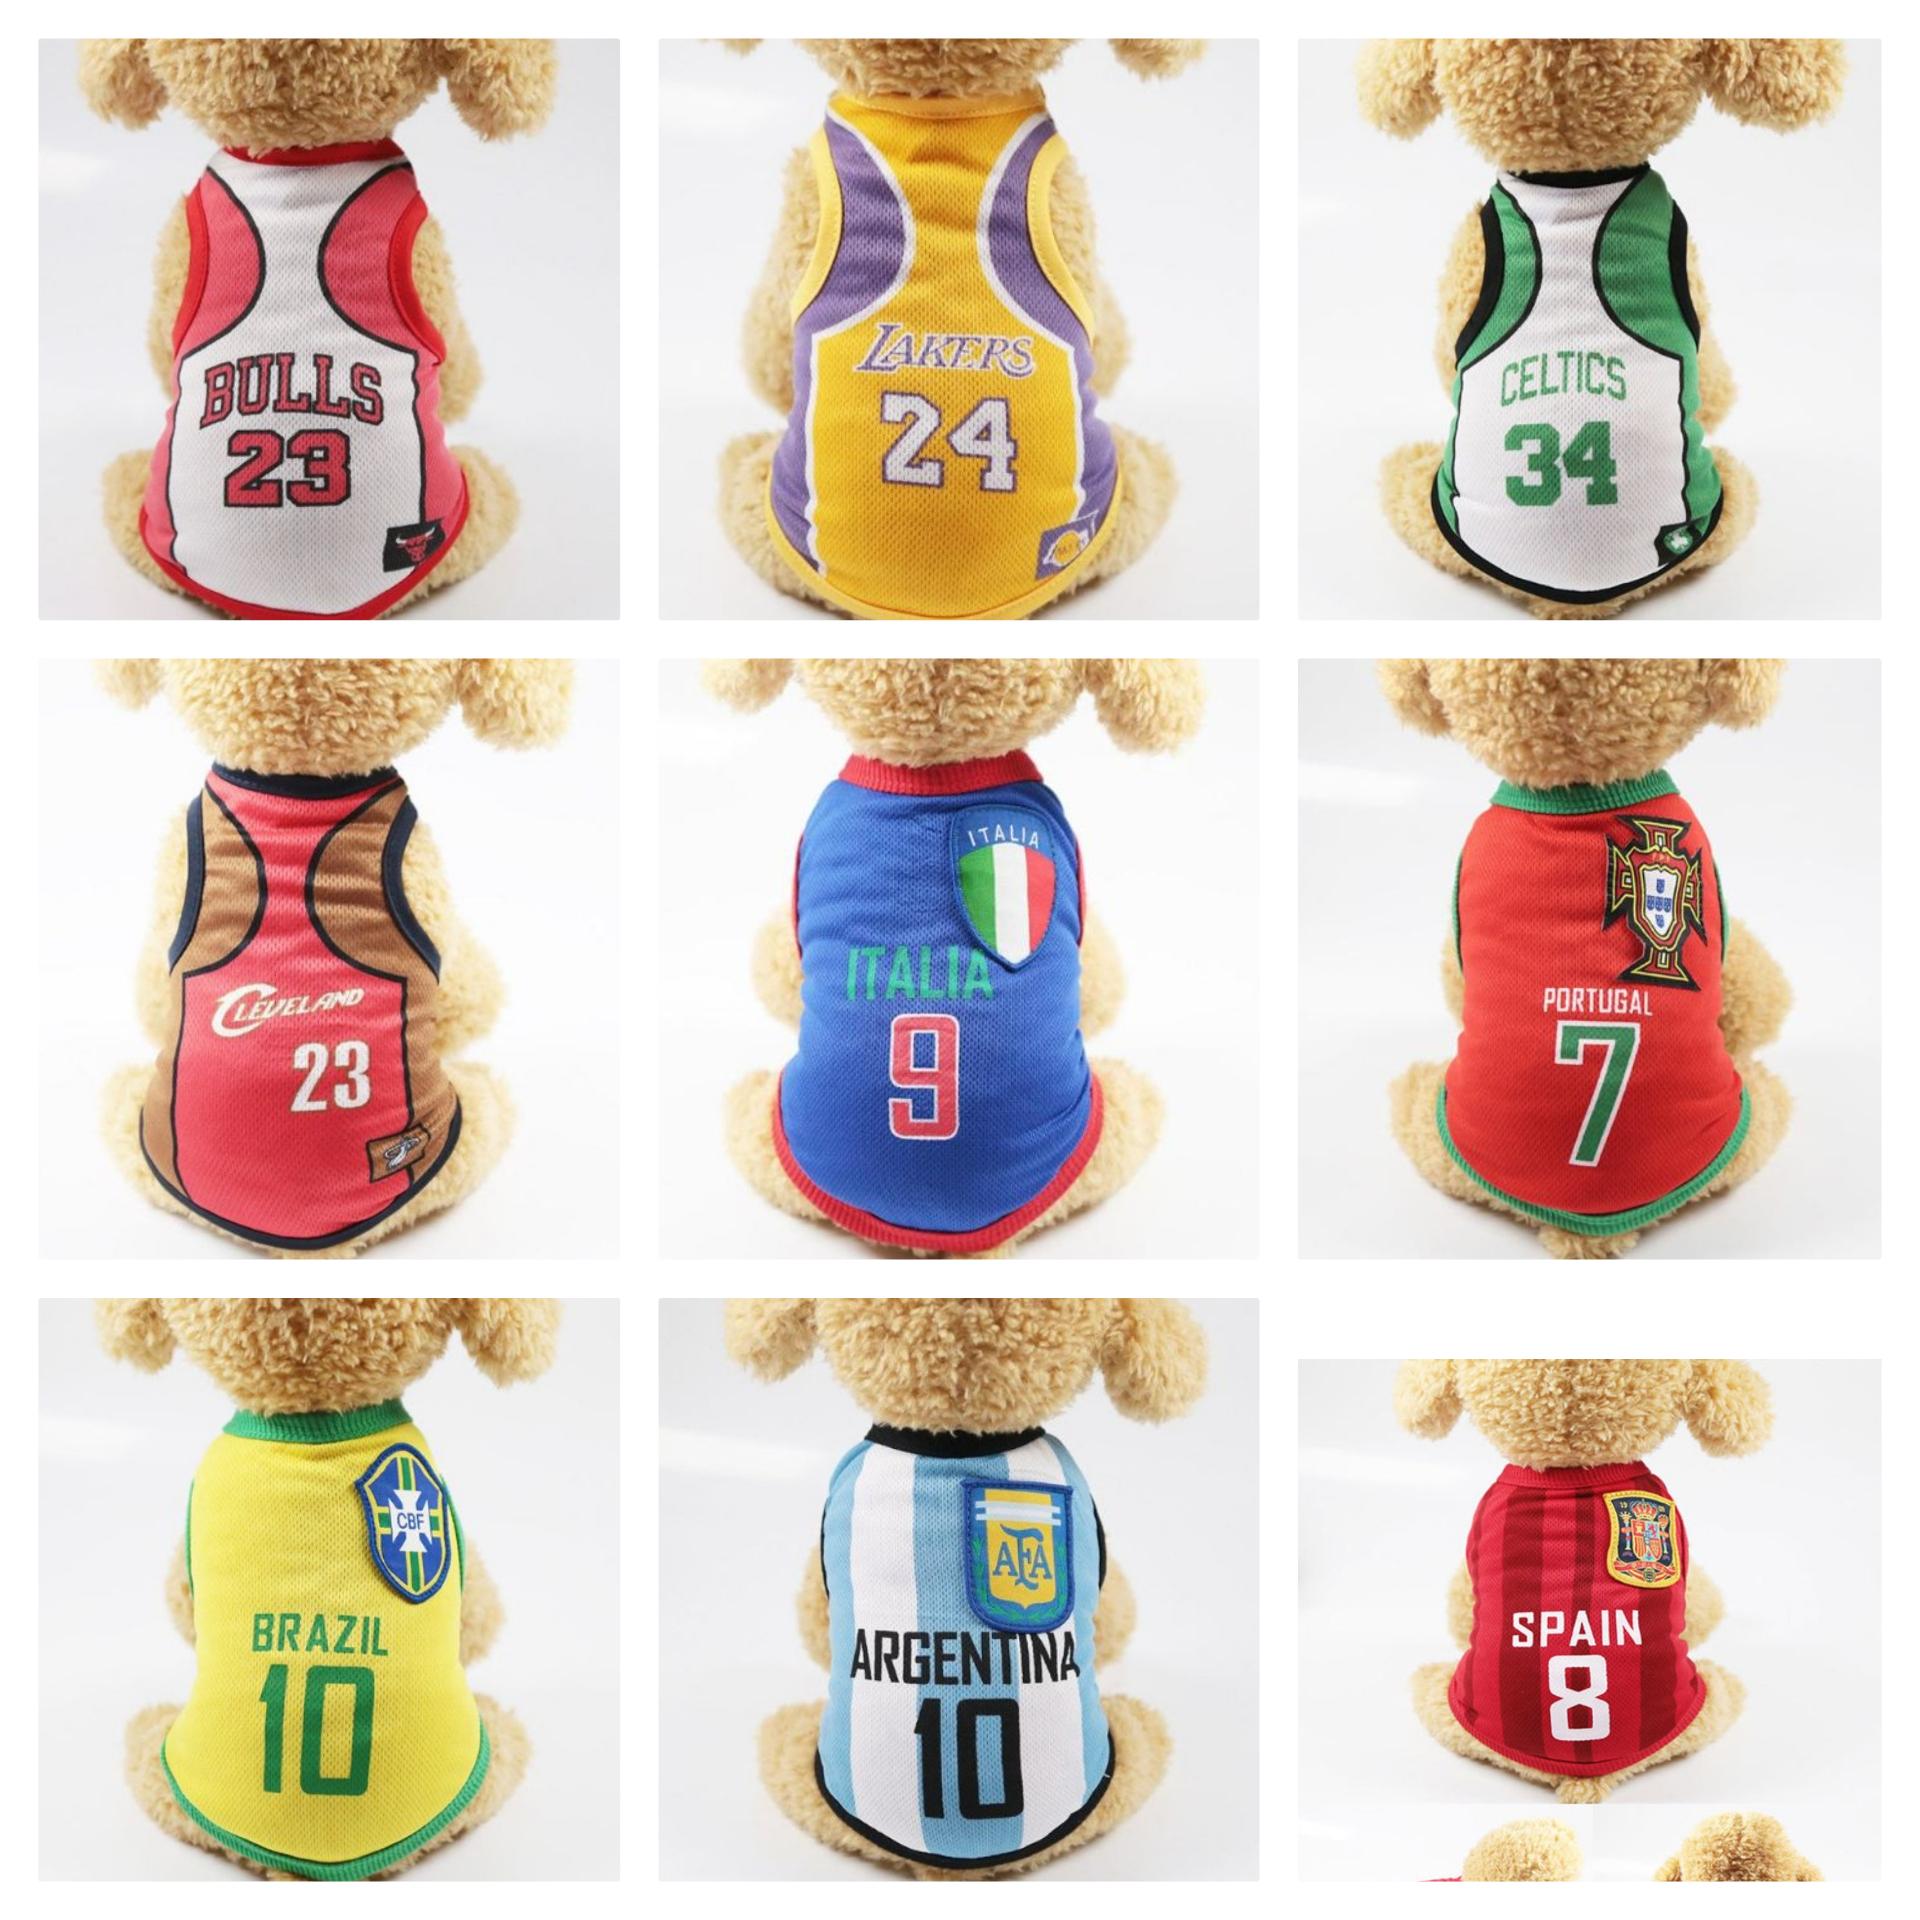 12 Tipos de camisetas de fútbol y baloncesto para mascotas (Tallas XS a XXXL)